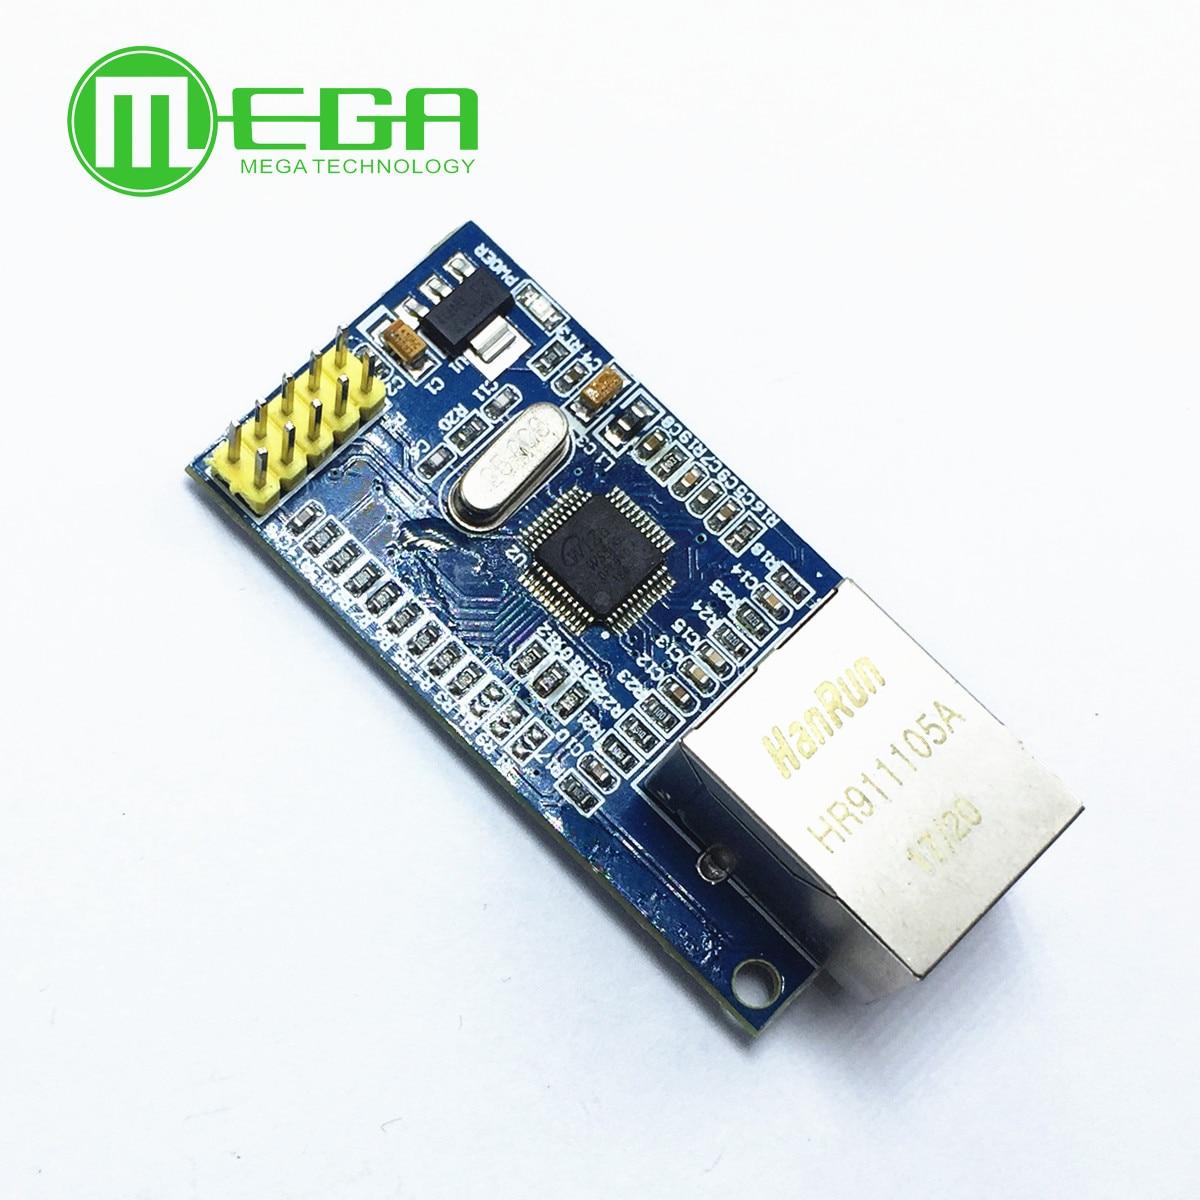 1pcs-for-font-b-arduino-b-font-w5500-ethernet-network-modules-for-font-b-arduino-b-font-tcp-ip-51-stm32-spi-interface-33v-5v-i-o-mcu